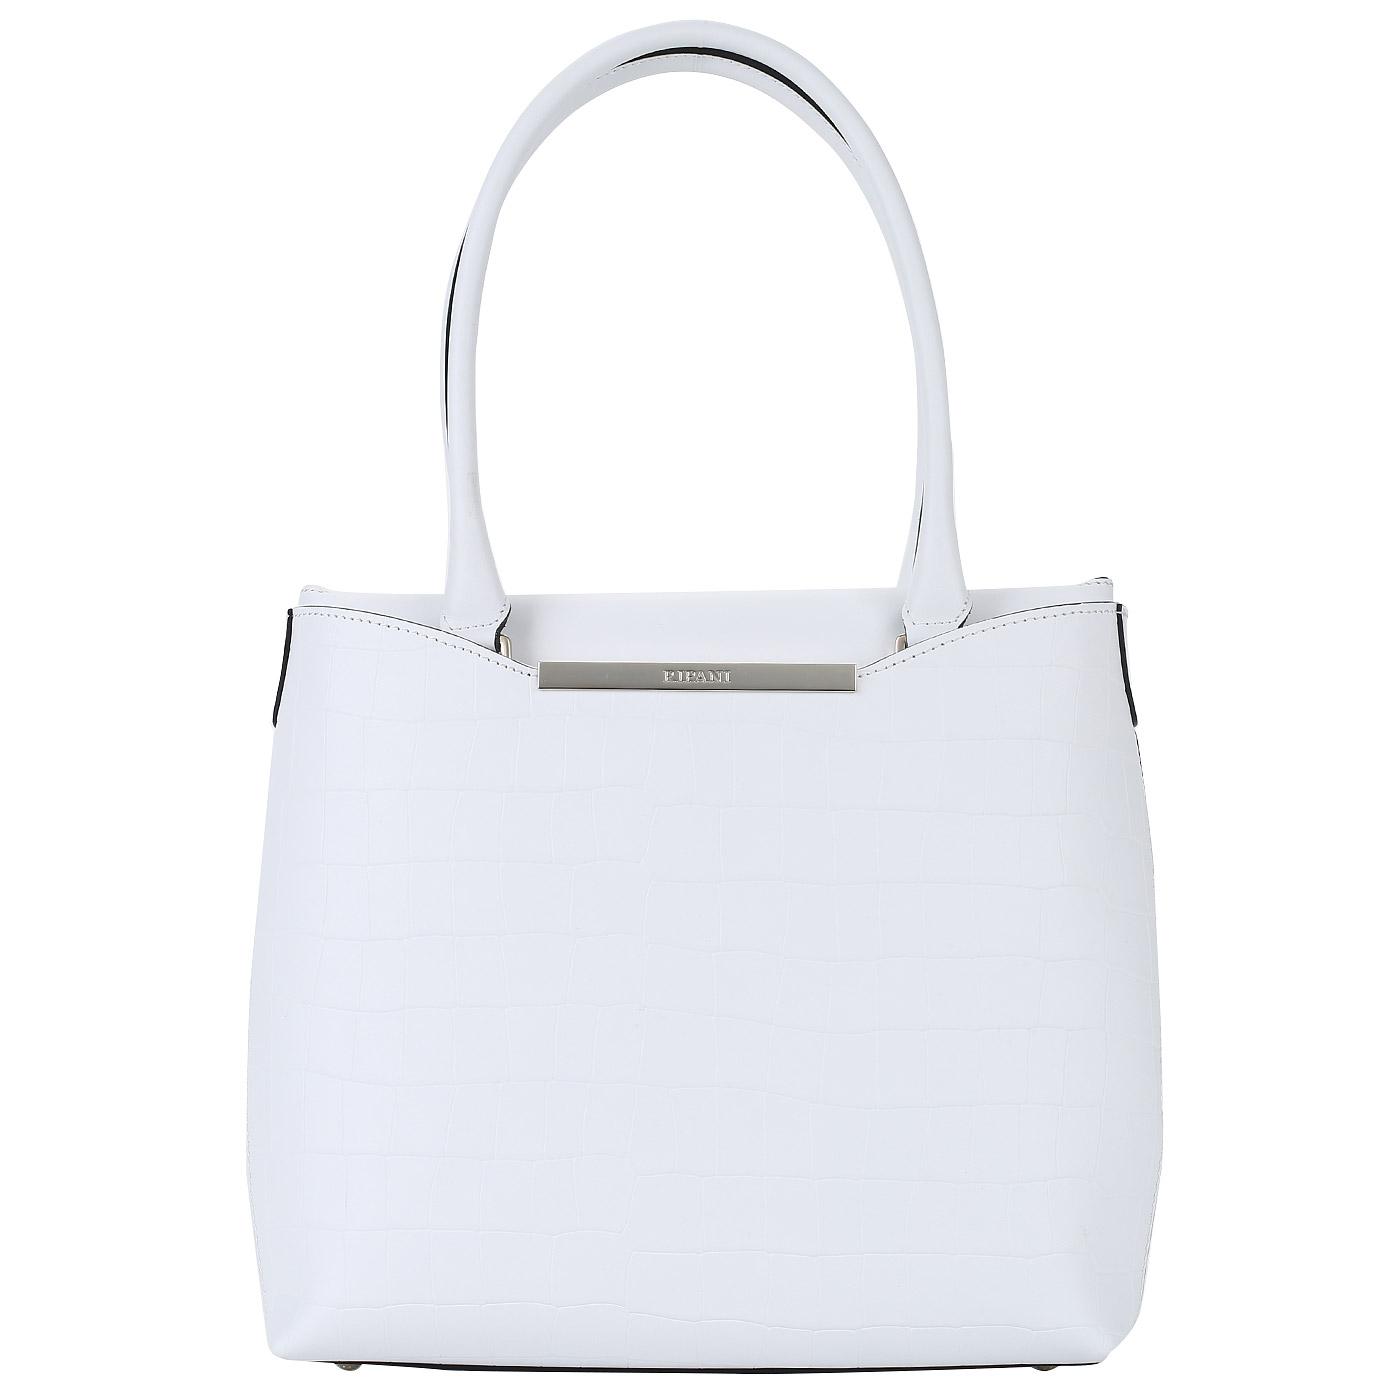 368682086d38 Белая кожаная сумка Ripani Capinera Белая кожаная сумка Ripani Capinera ...